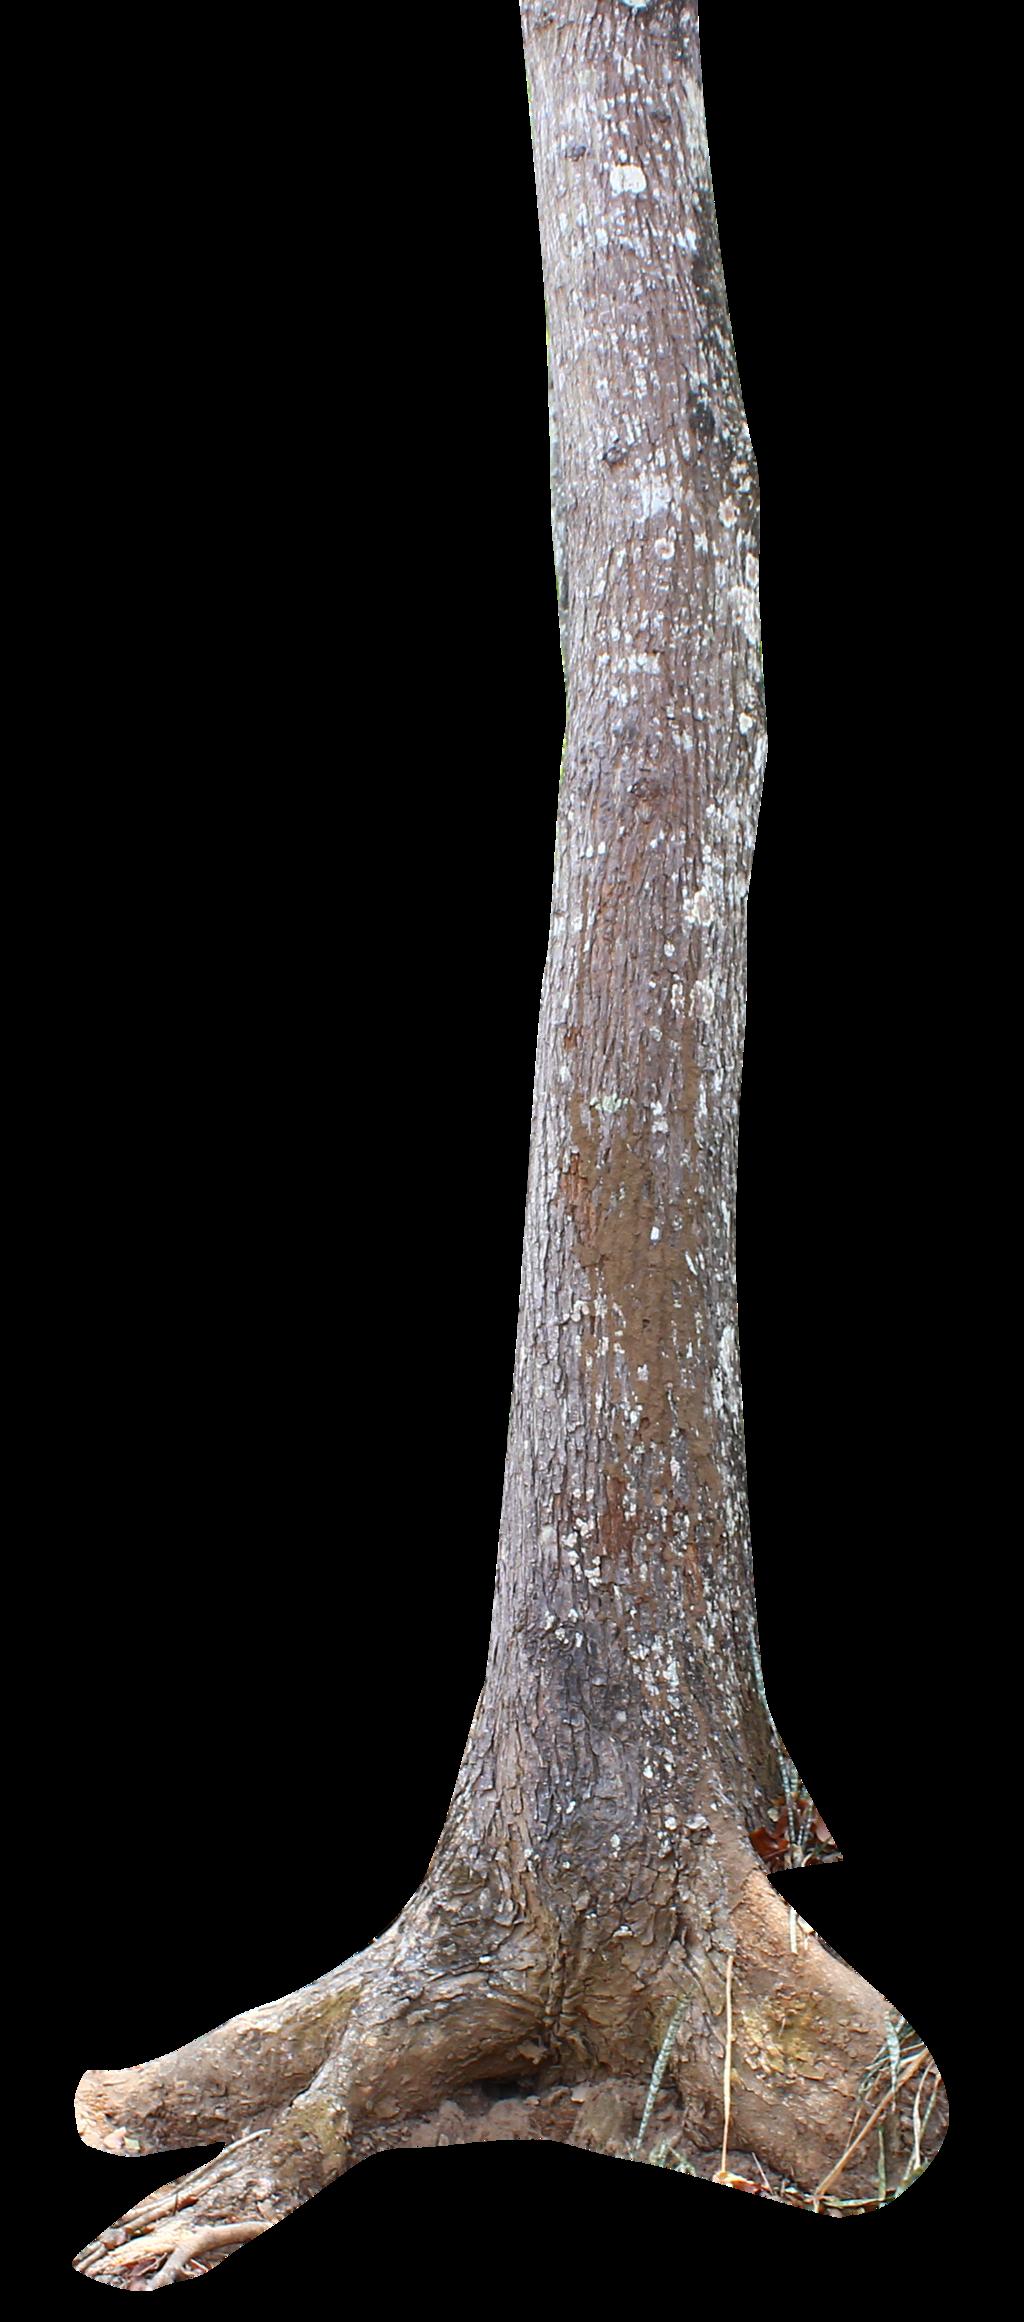 Tree Trunk Png By Andhikazanuar Tree Trunk Png By Andhikazanuar - PNG Tree Trunk